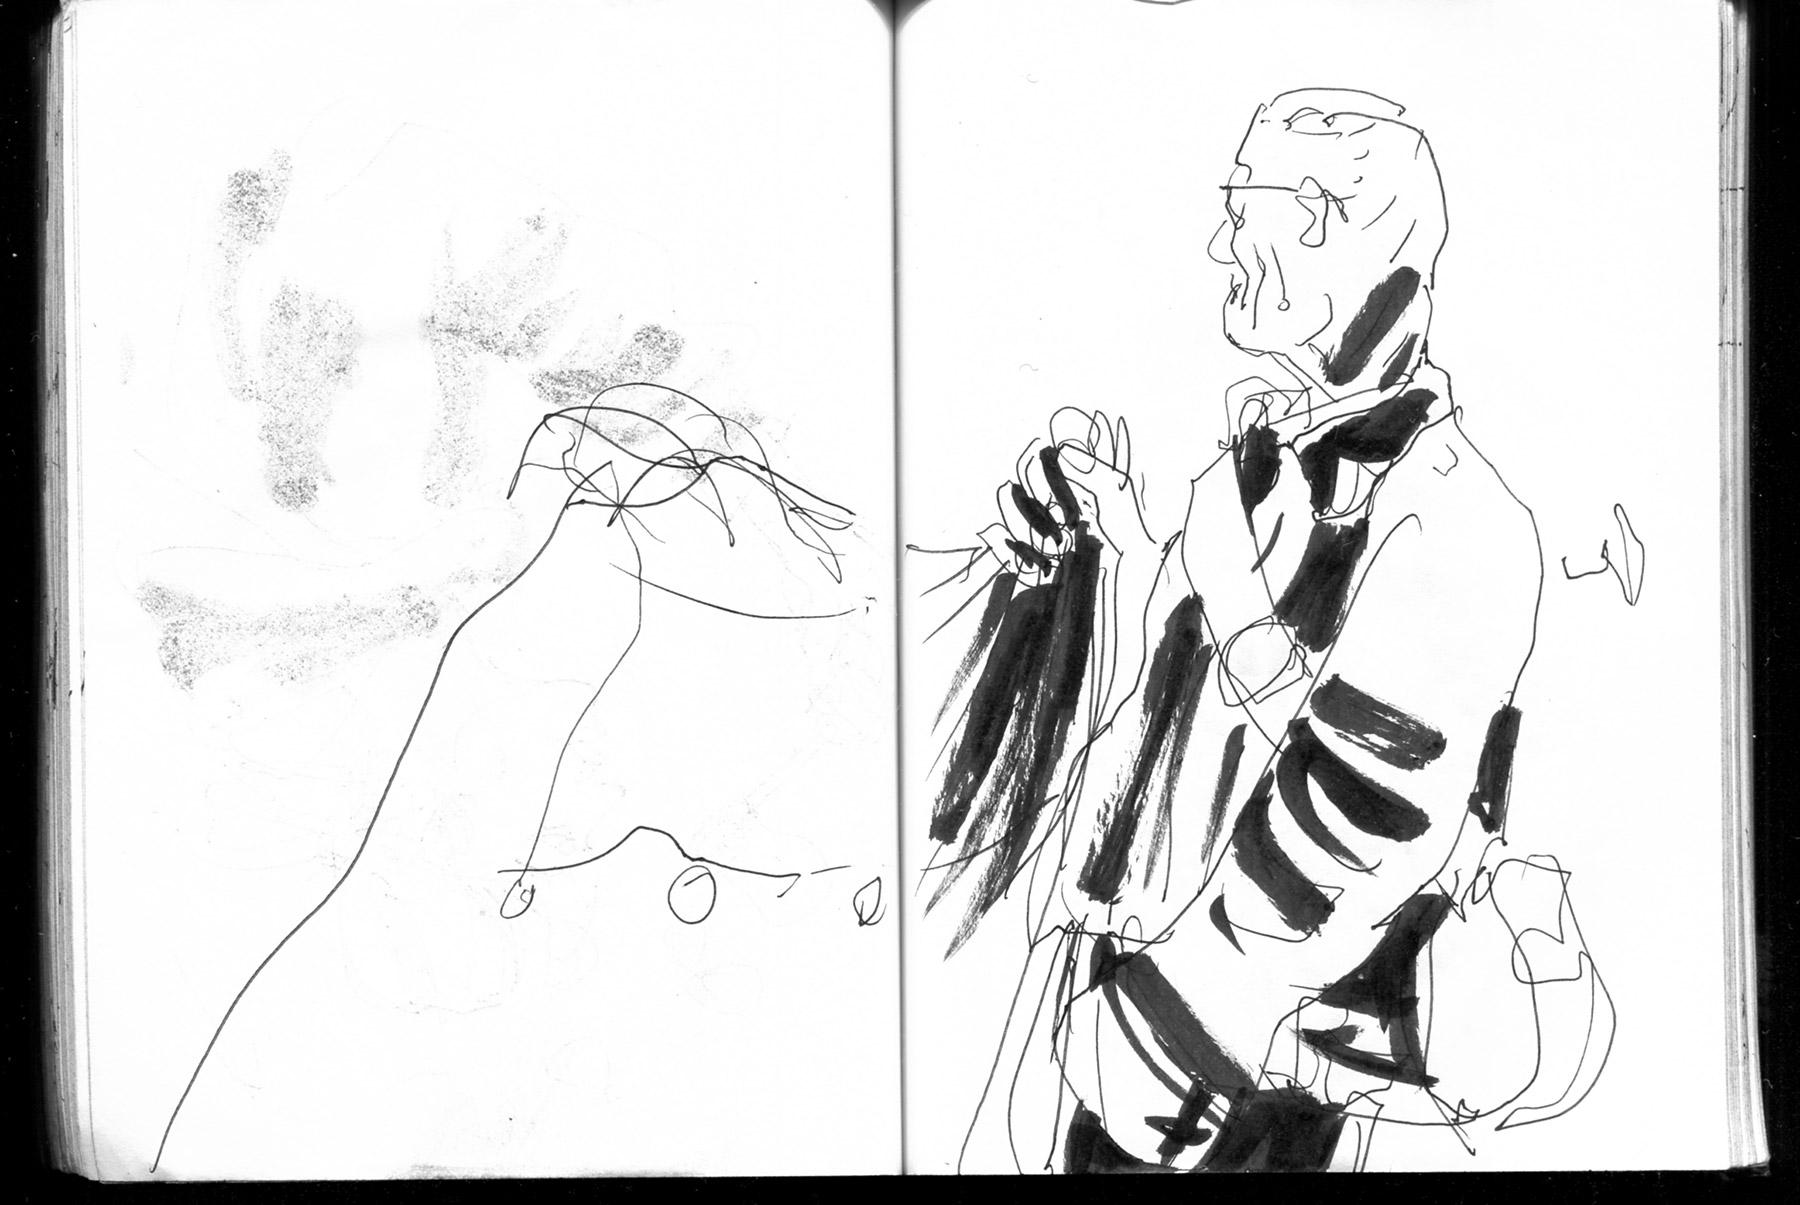 davidm_sketches_2014_08-144.jpg